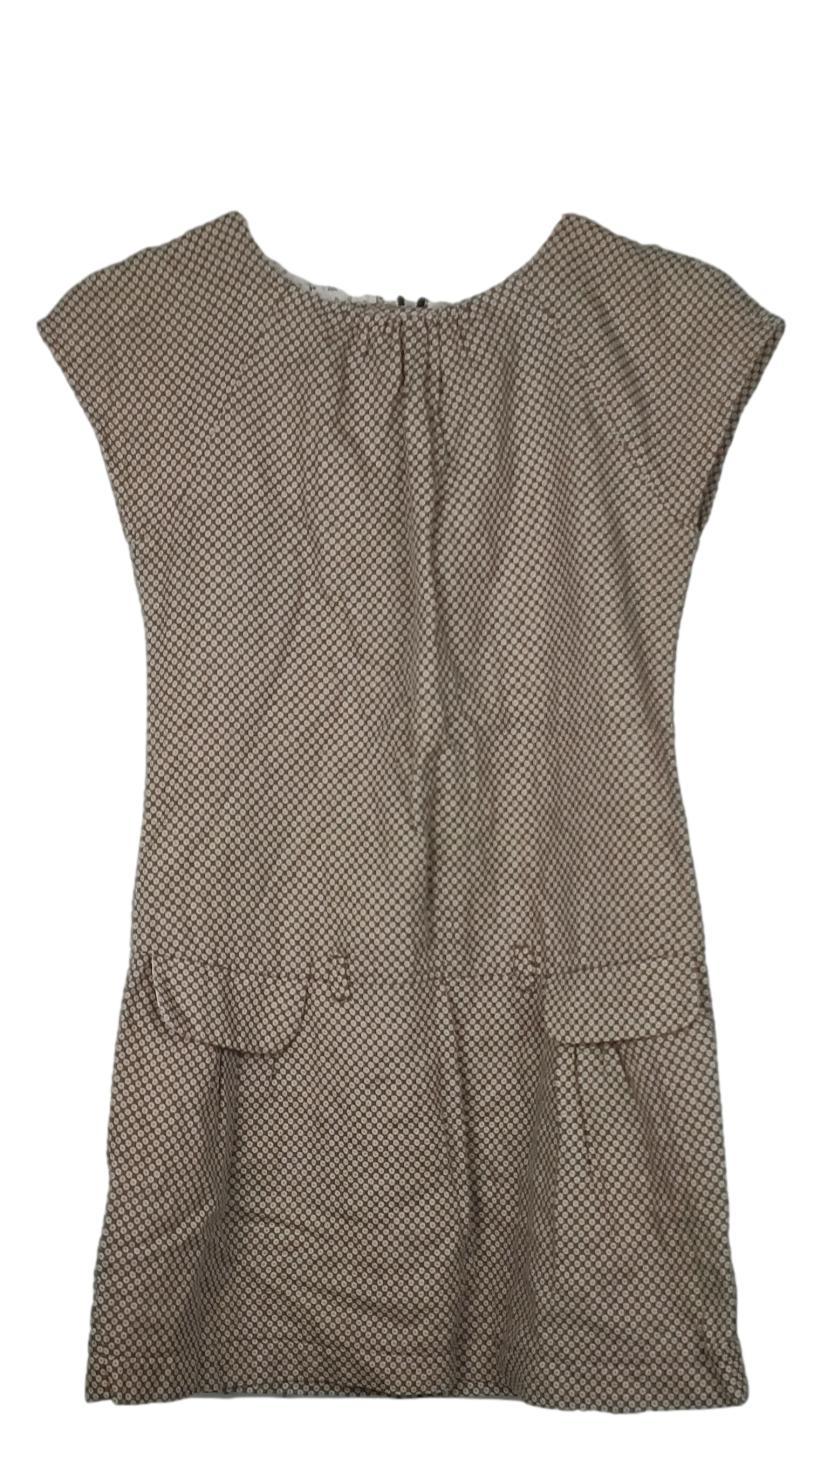 Zara- taille1-12 ans